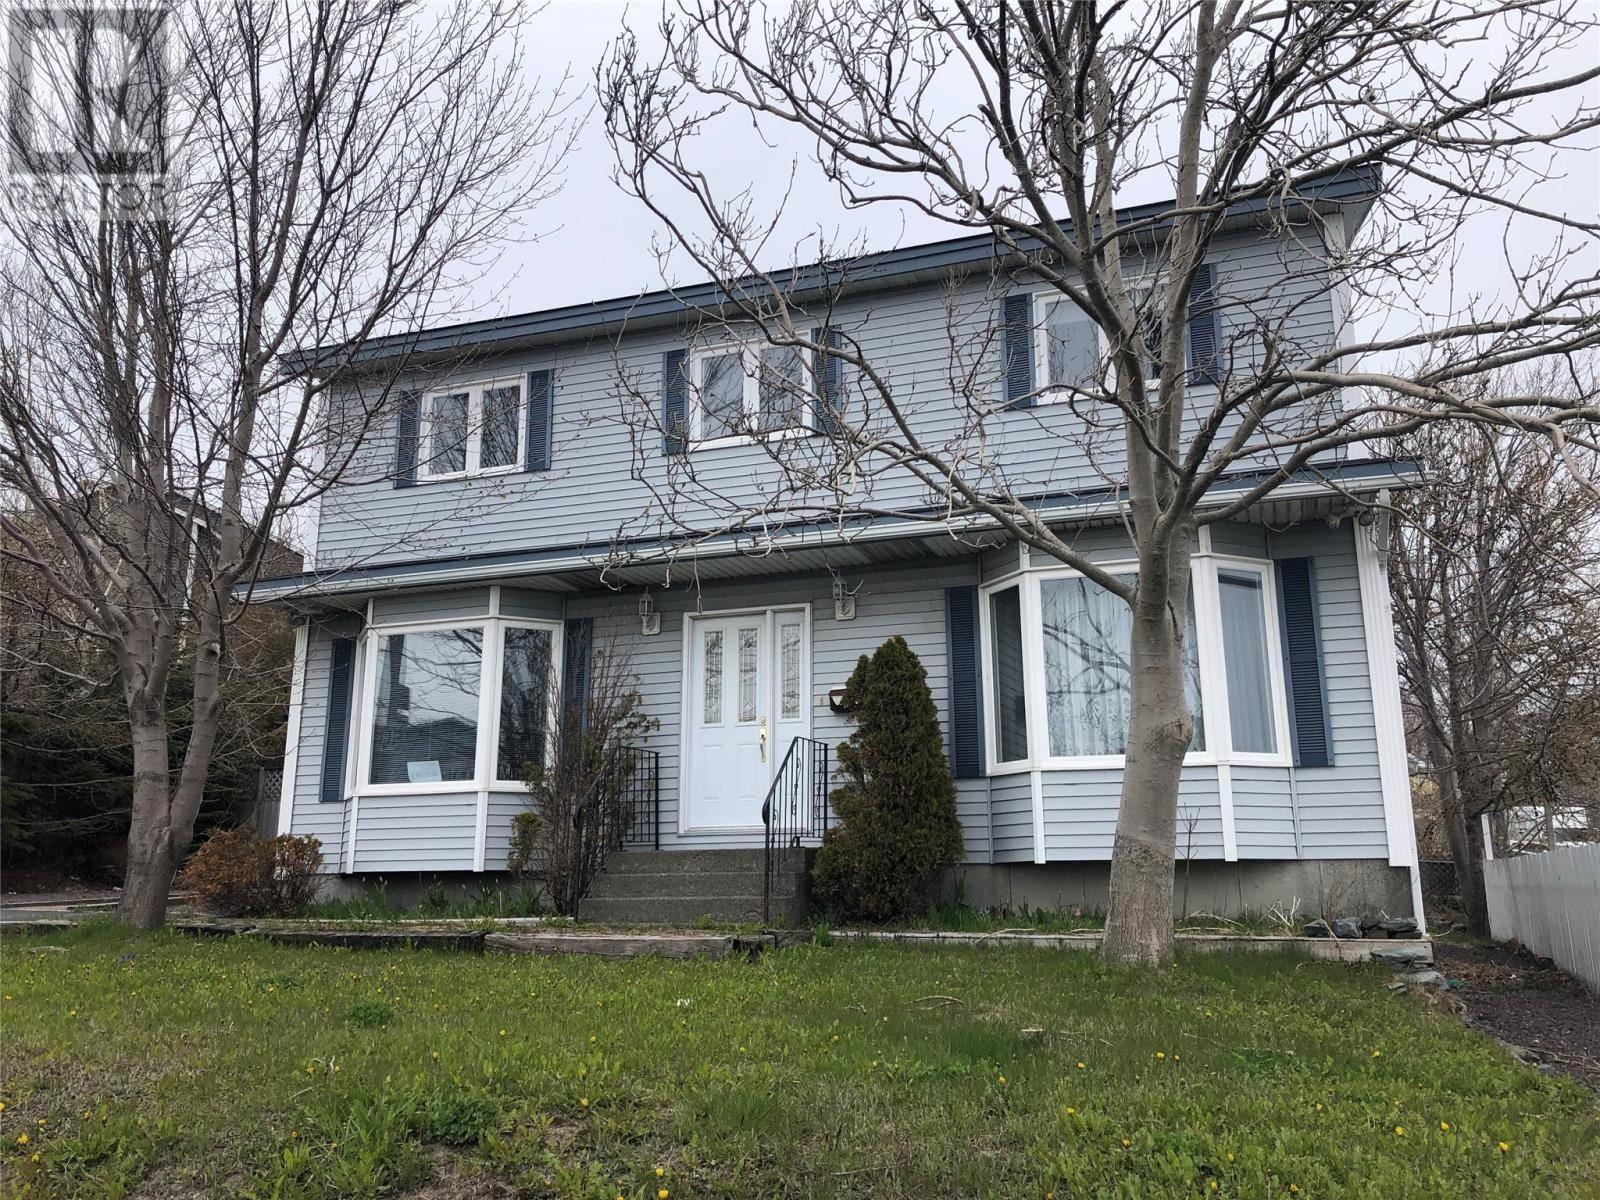 House for sale at 532 Newfoundland Dr St. John's Newfoundland - MLS: 1205489